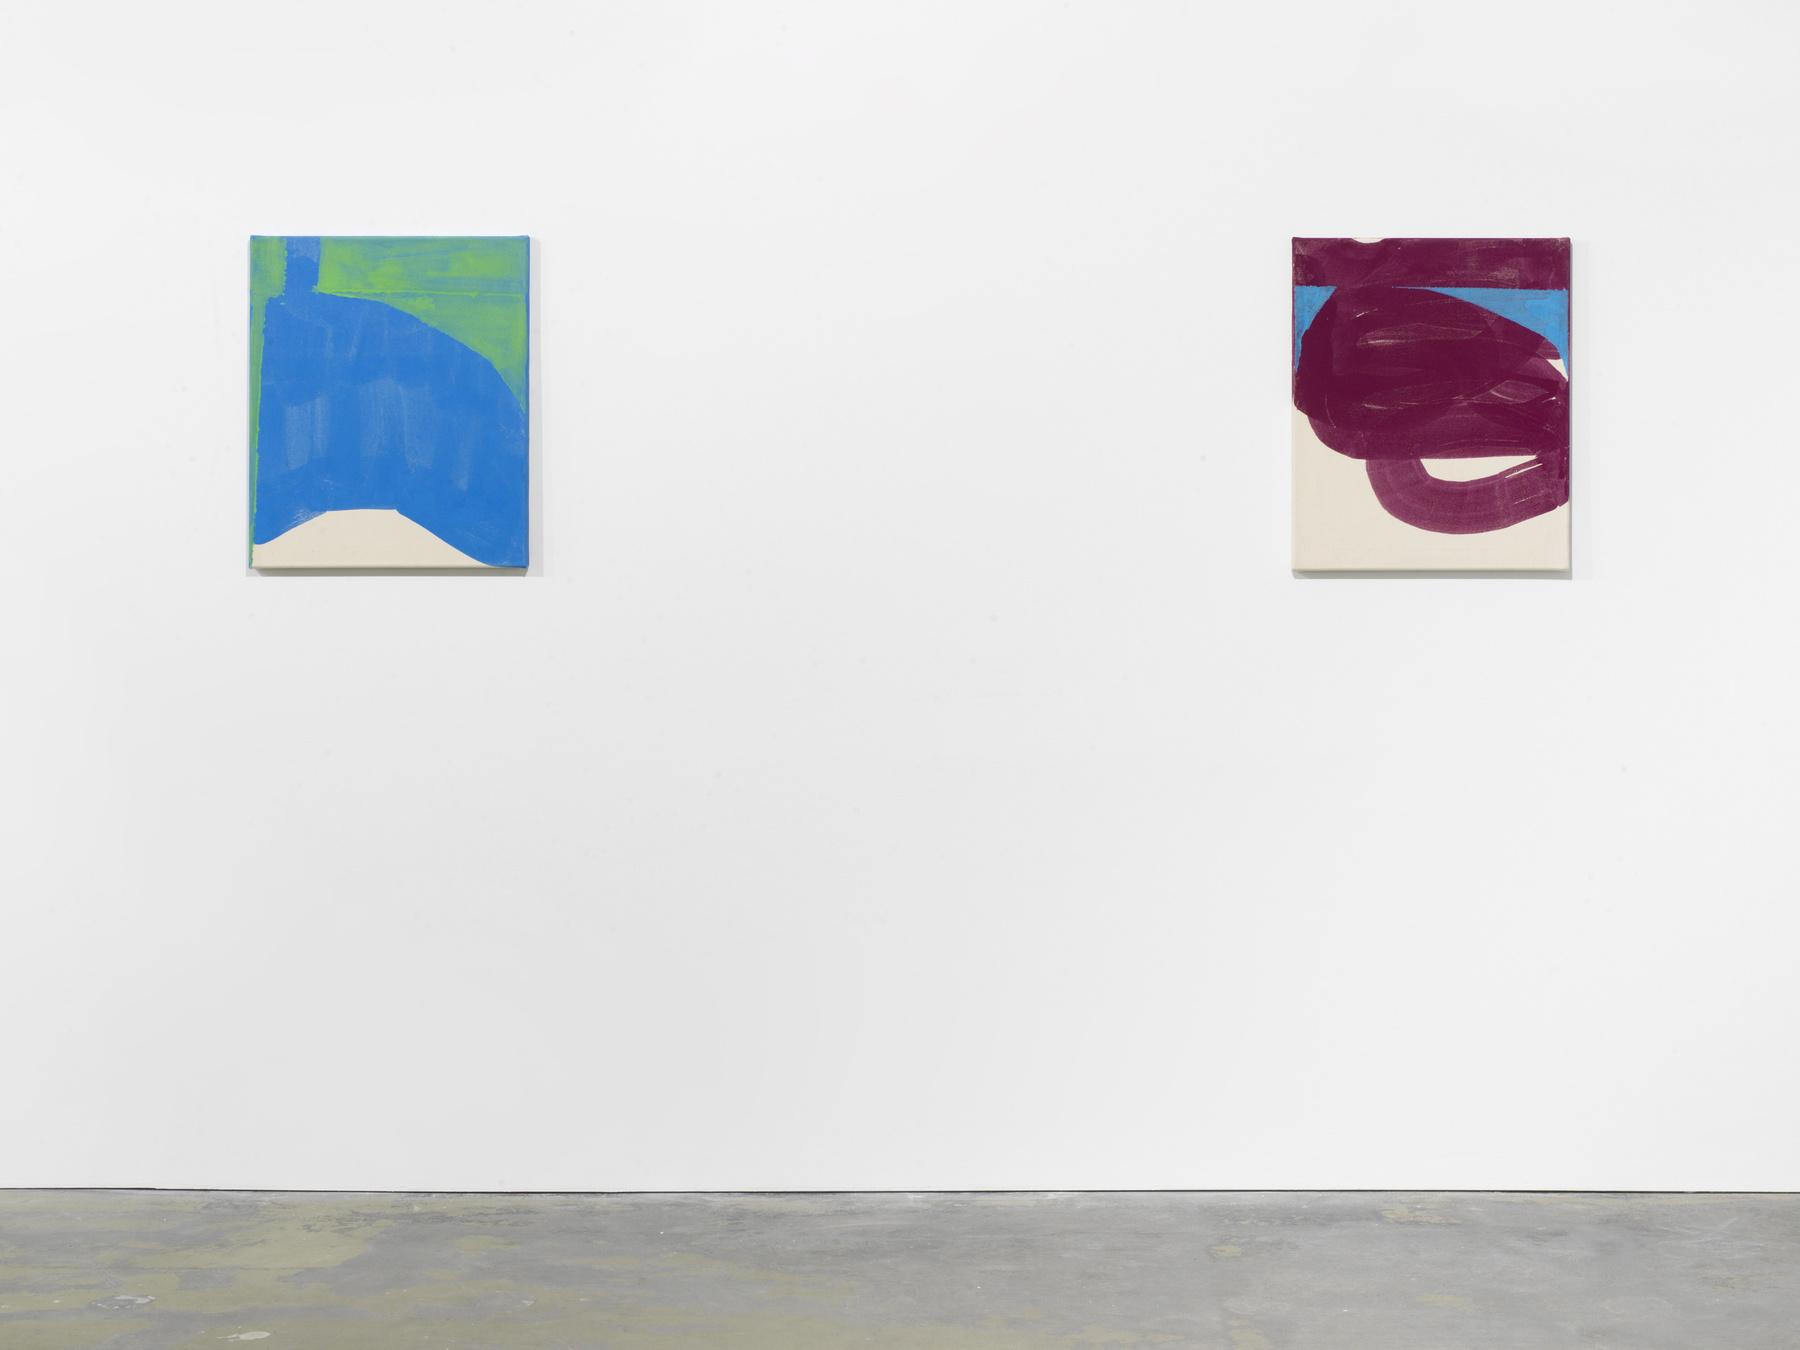 Tamina Amadyar_10,000 hours_Galerie Guido W. Baudach, Berlin_03